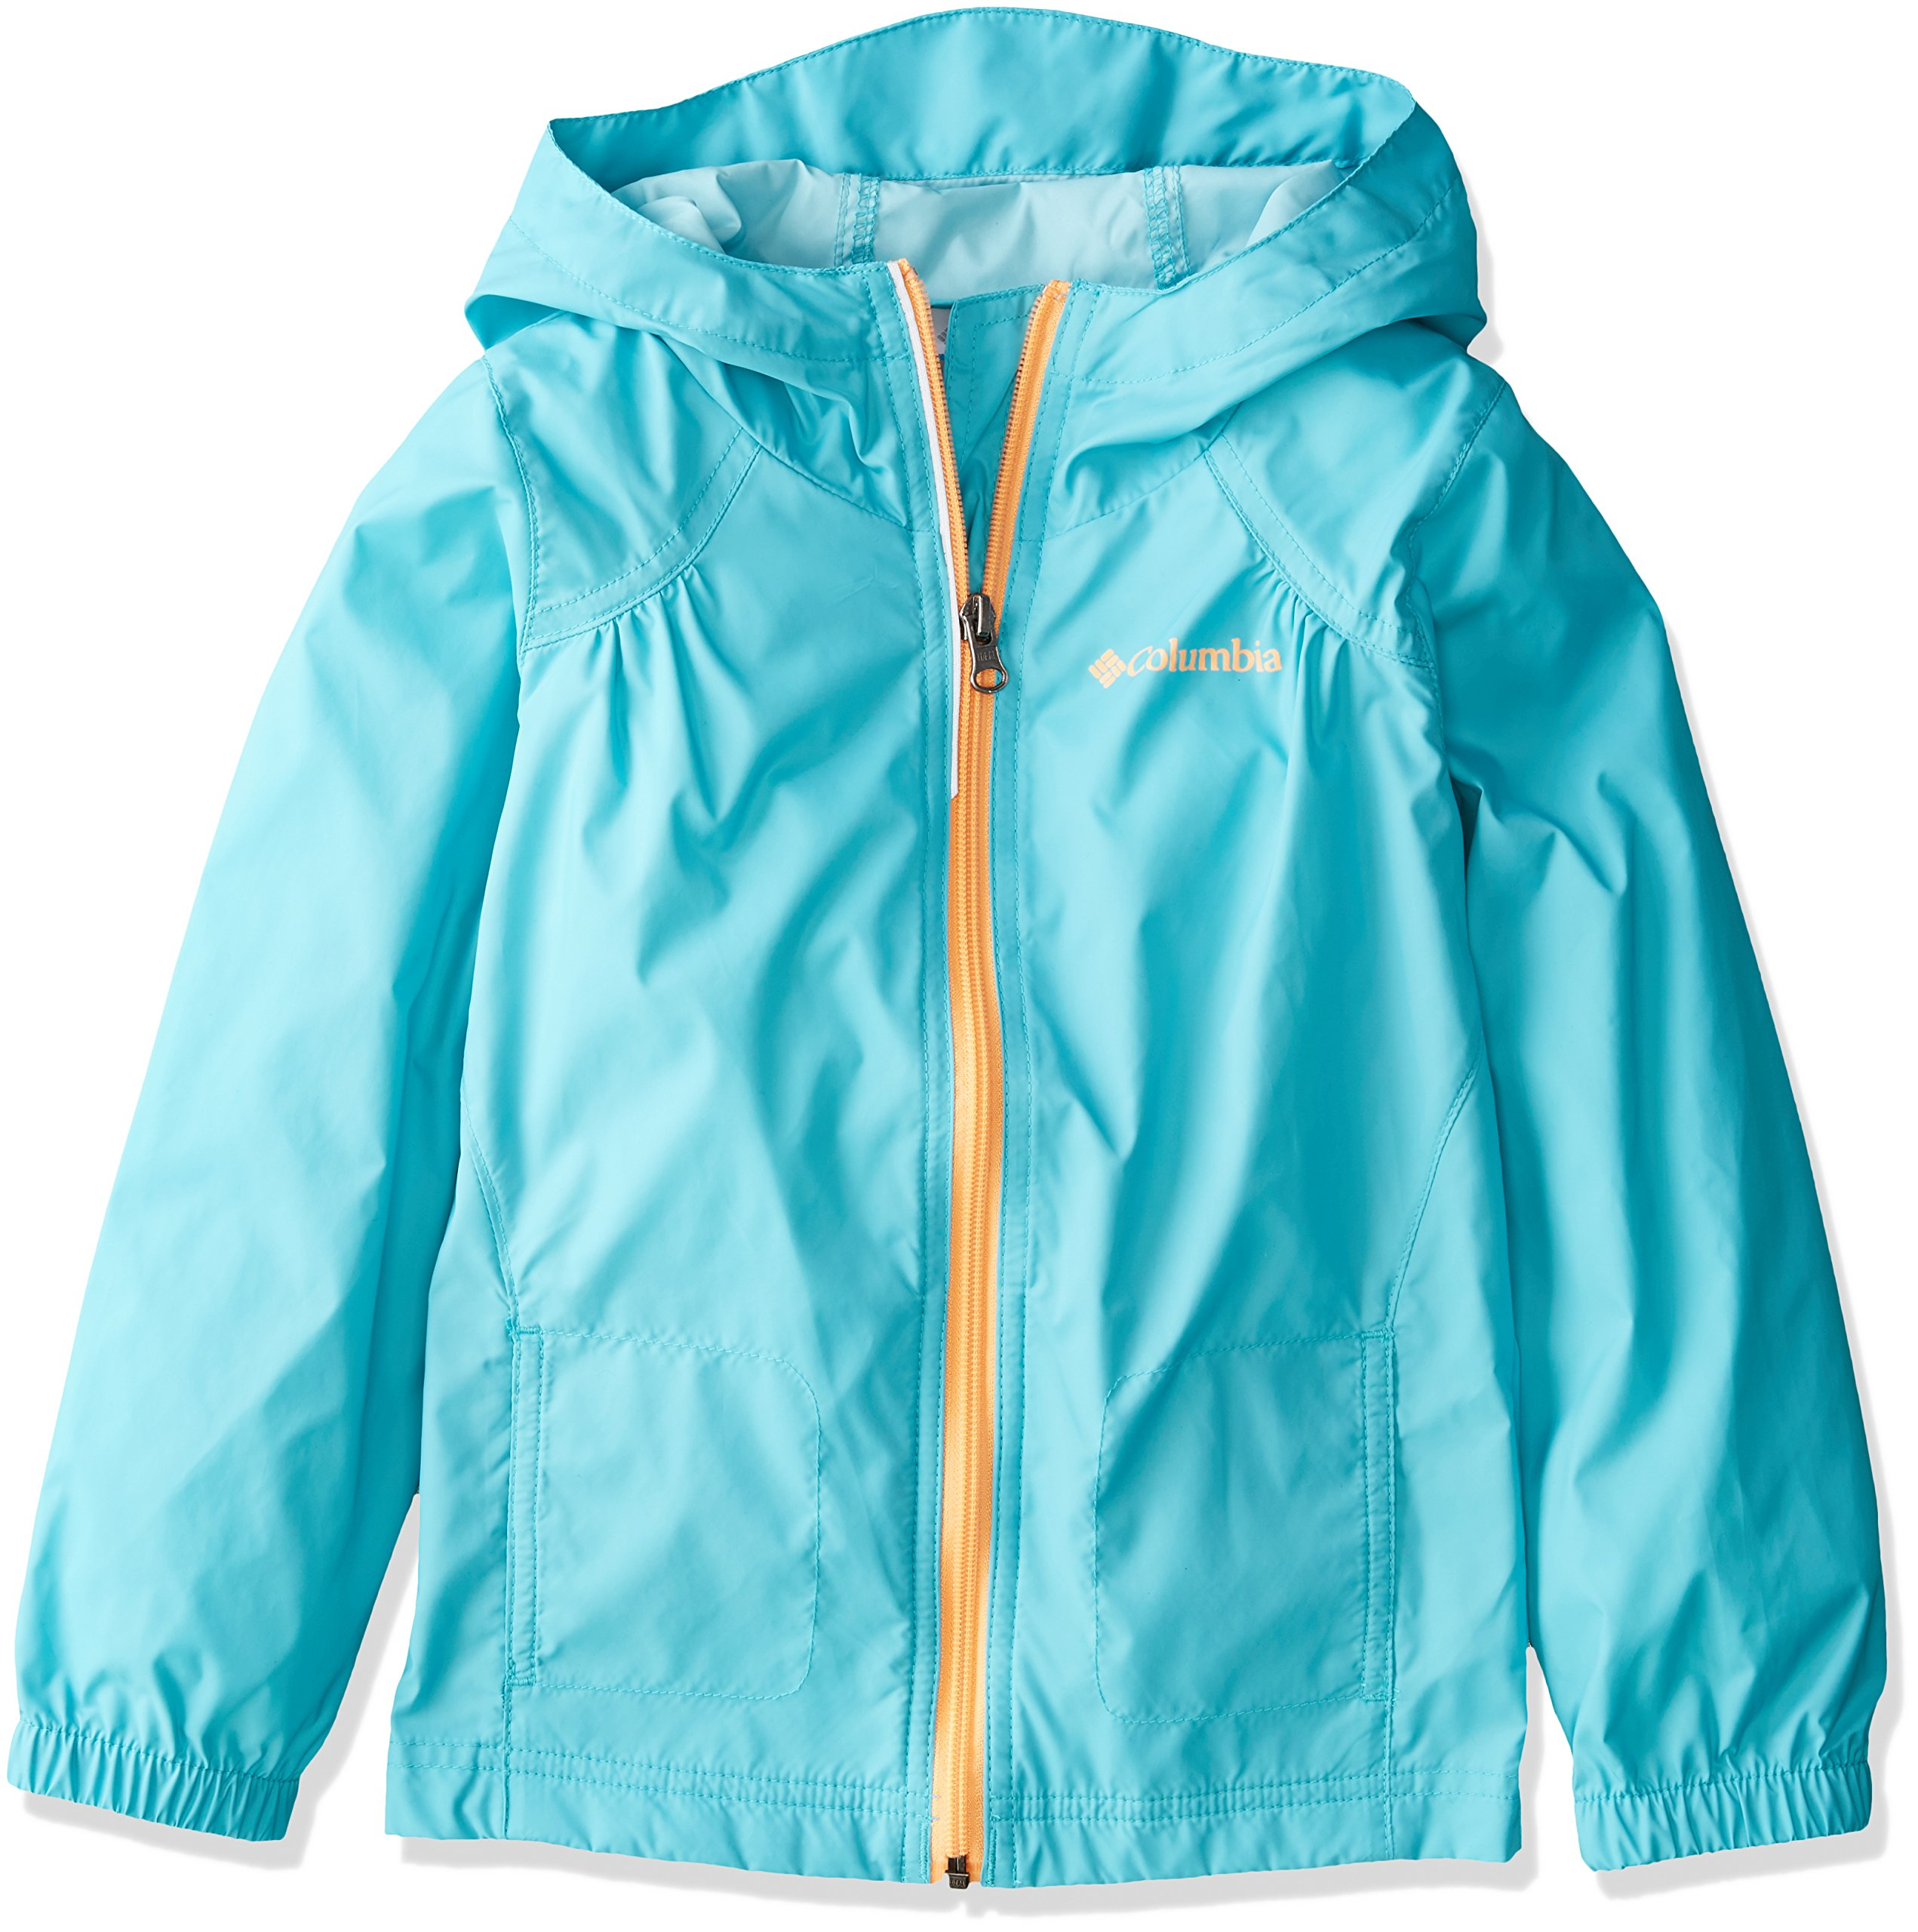 Columbia Little Girl's Switchback Rain Jacket, Geyser, S